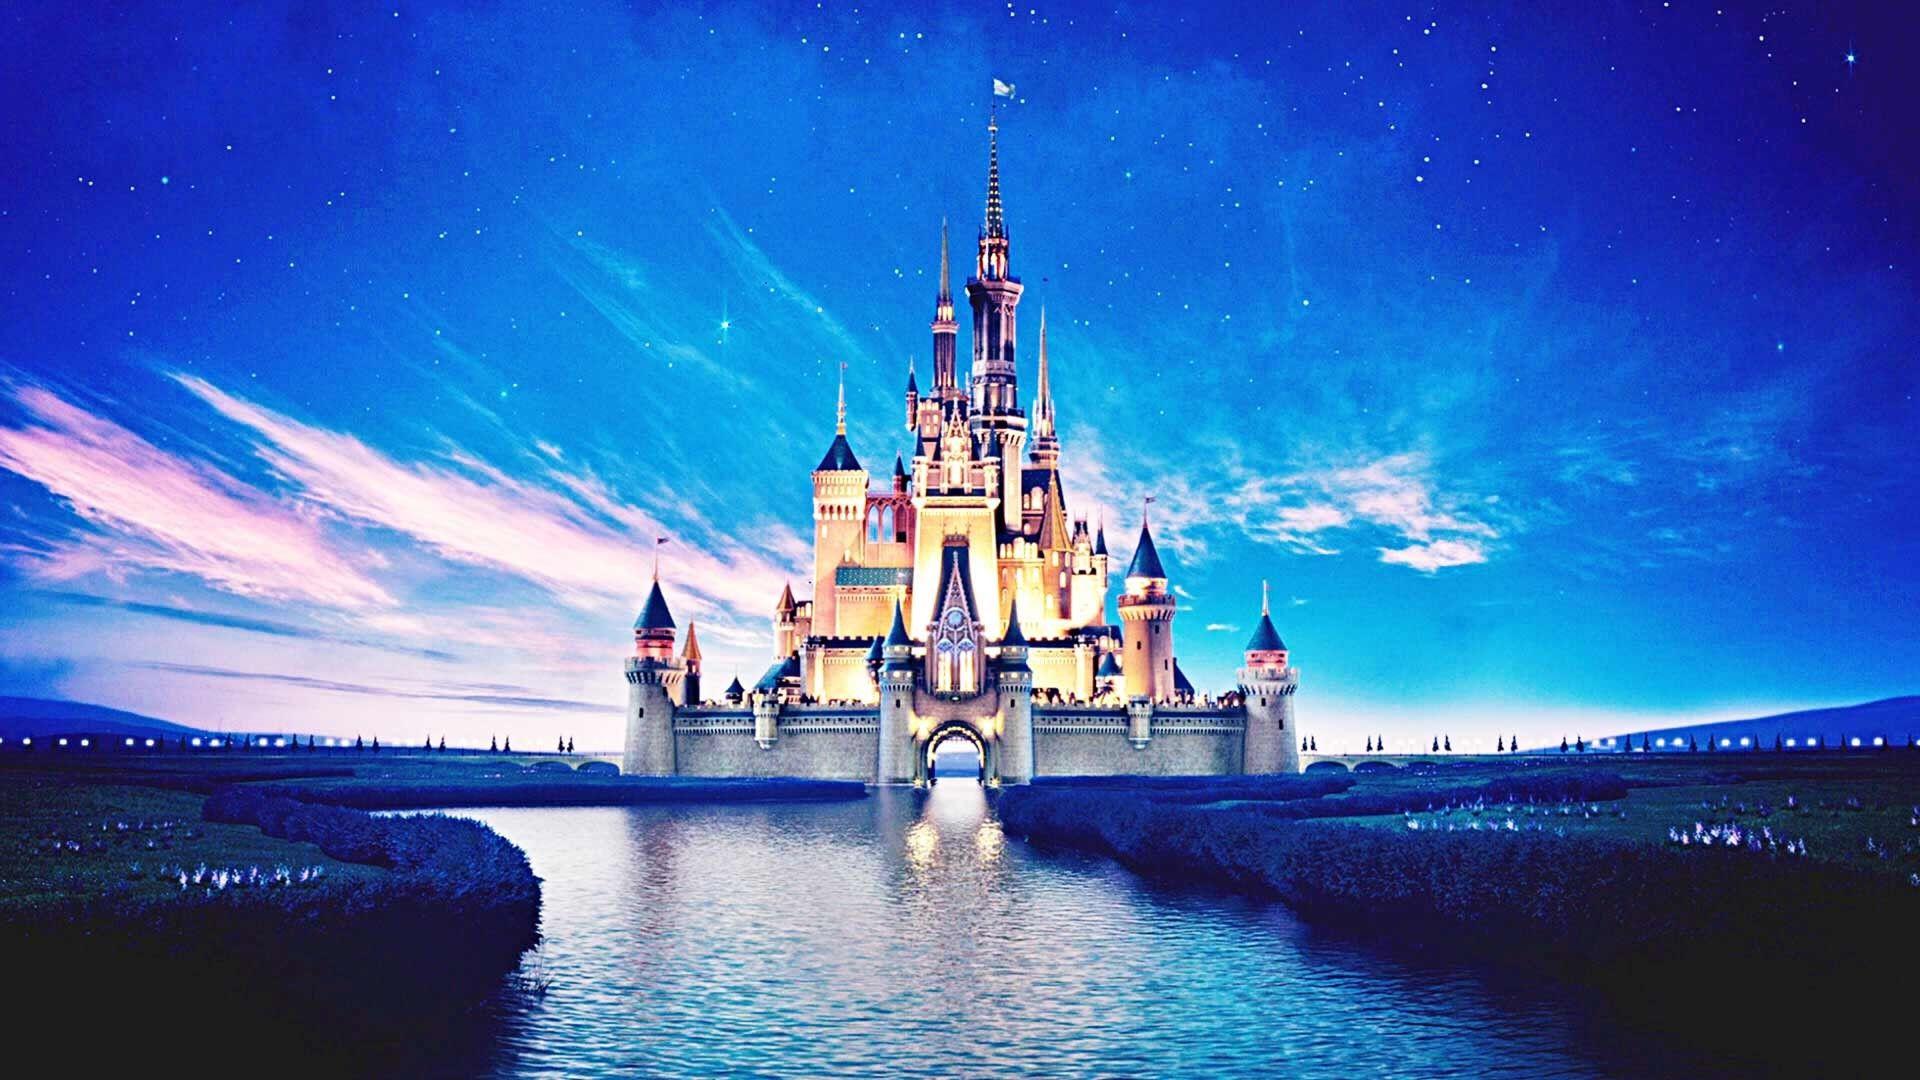 Disney Desktop Wallpaper Free In 2020 Disney Desktop Wallpaper Disney Background Disney Castle